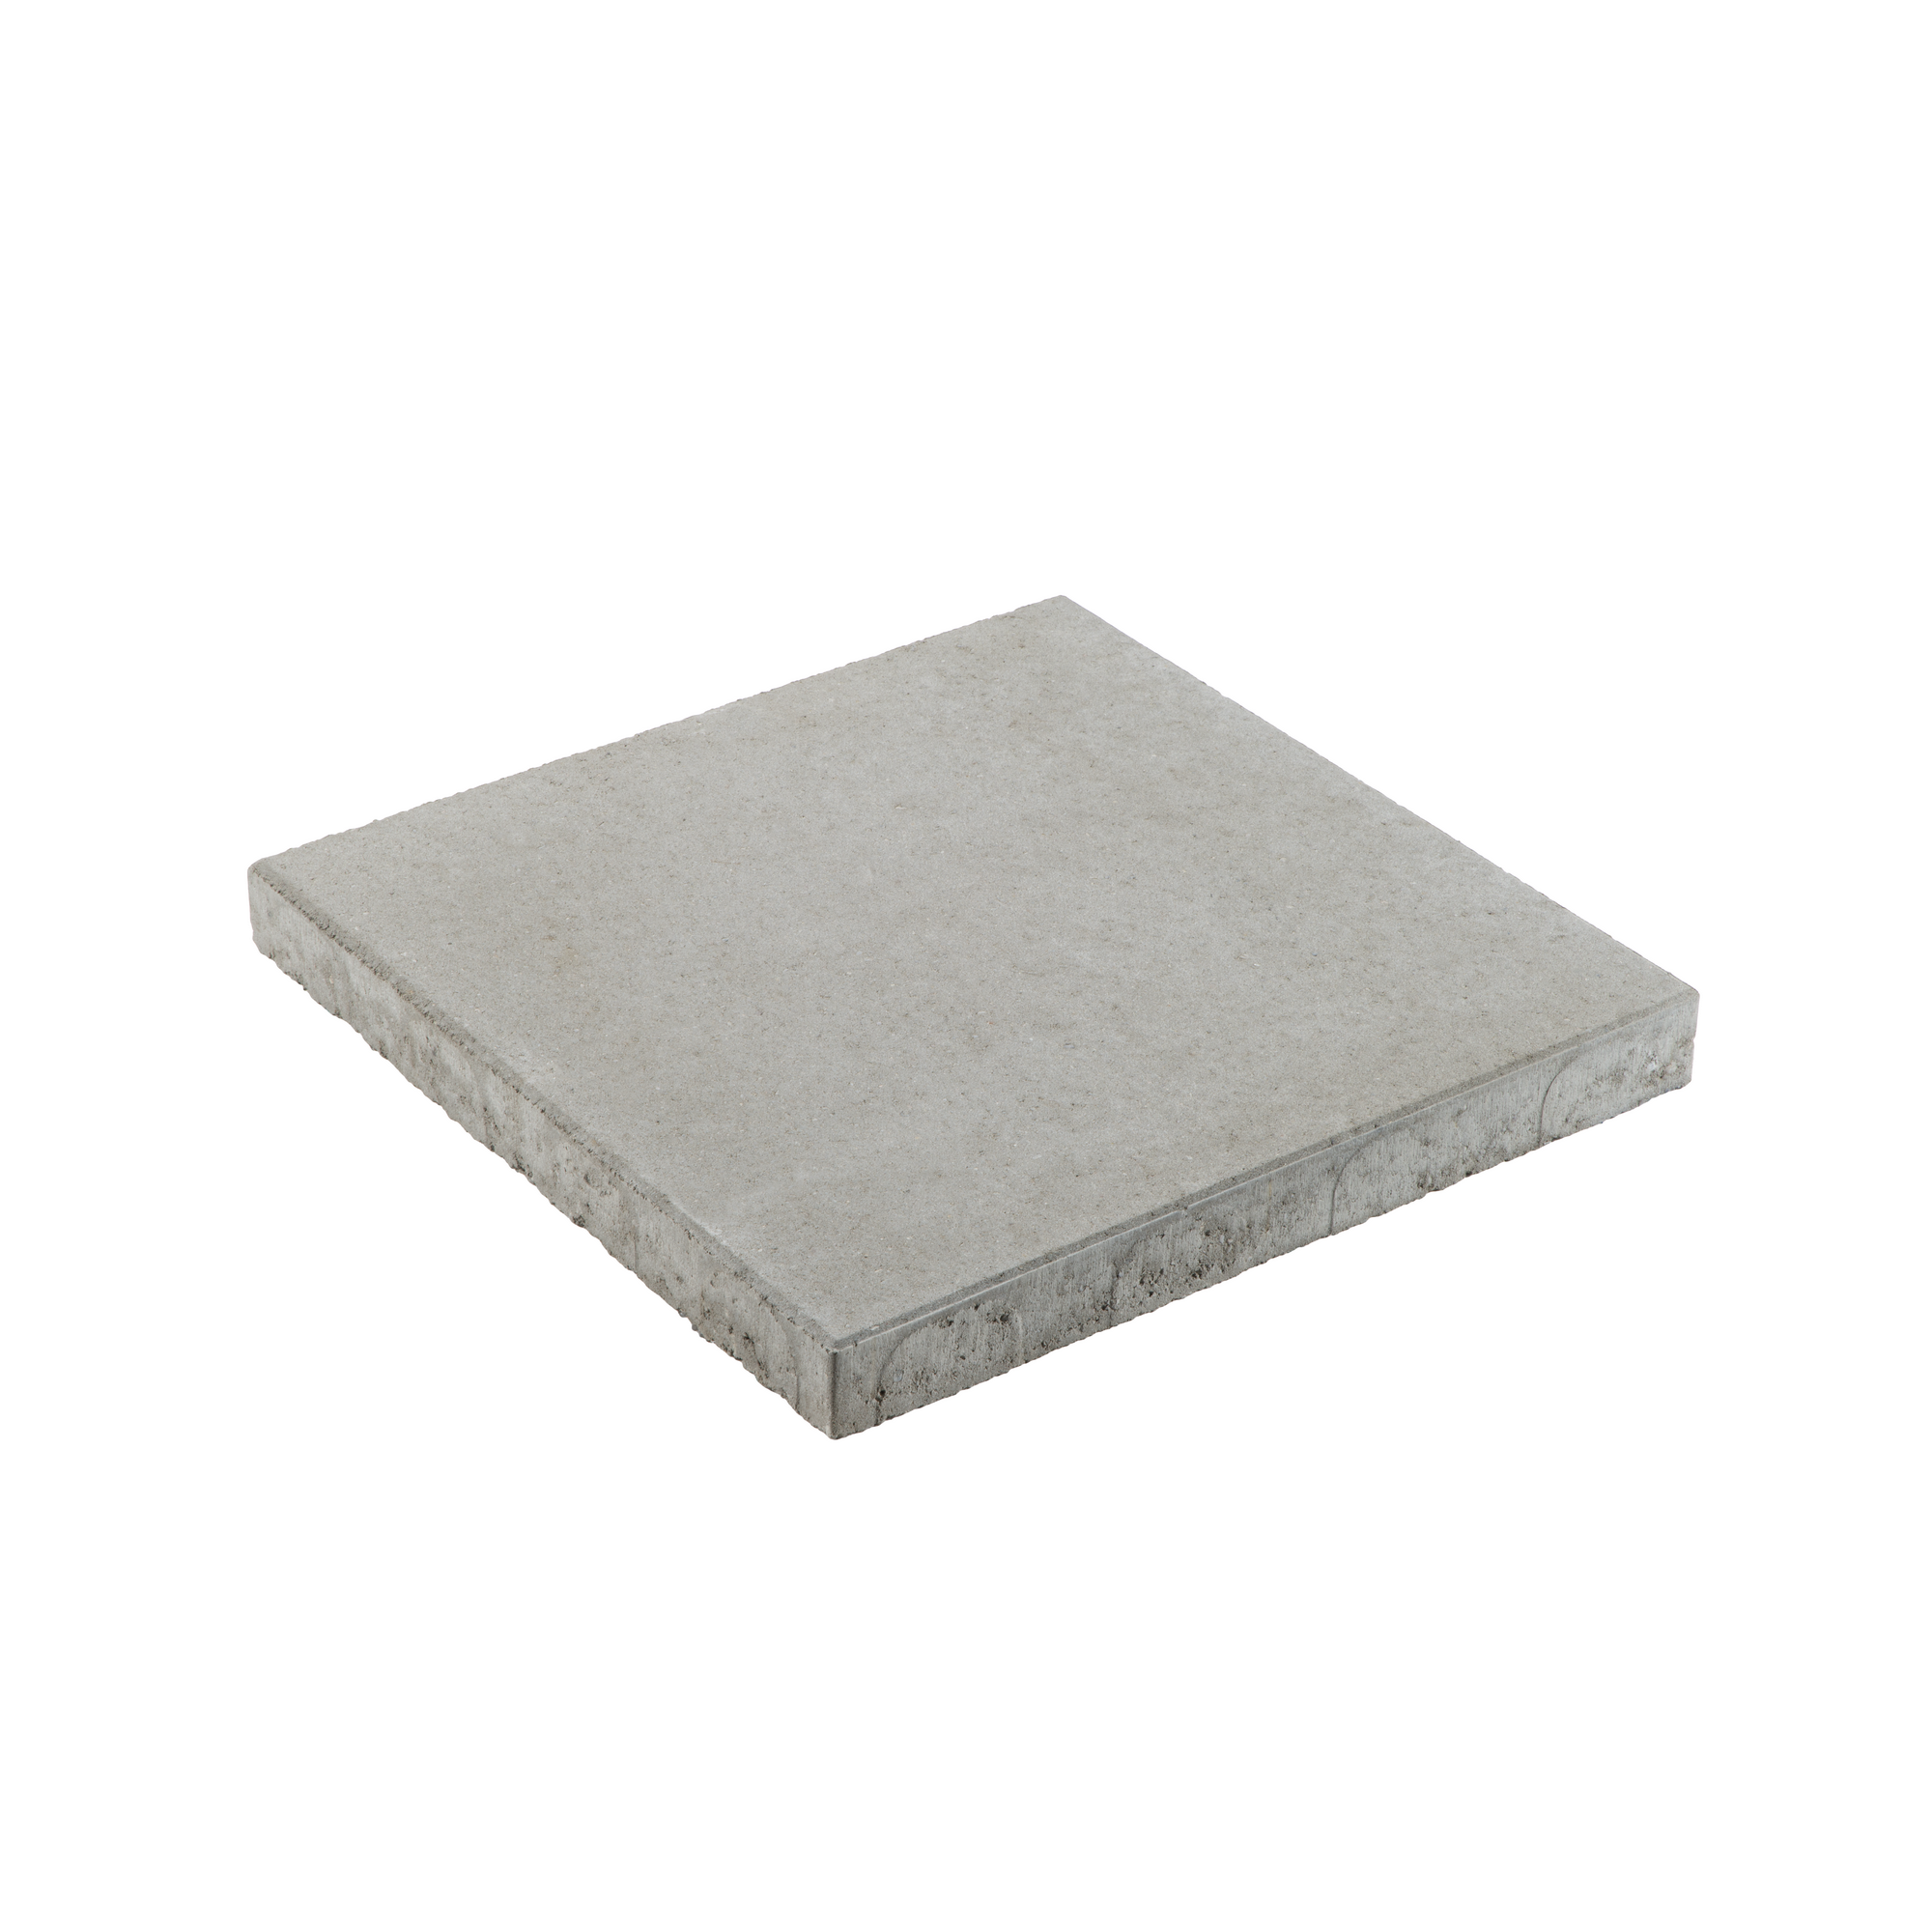 Lusit Betonplatte grau 20 x 20 x 20 cm